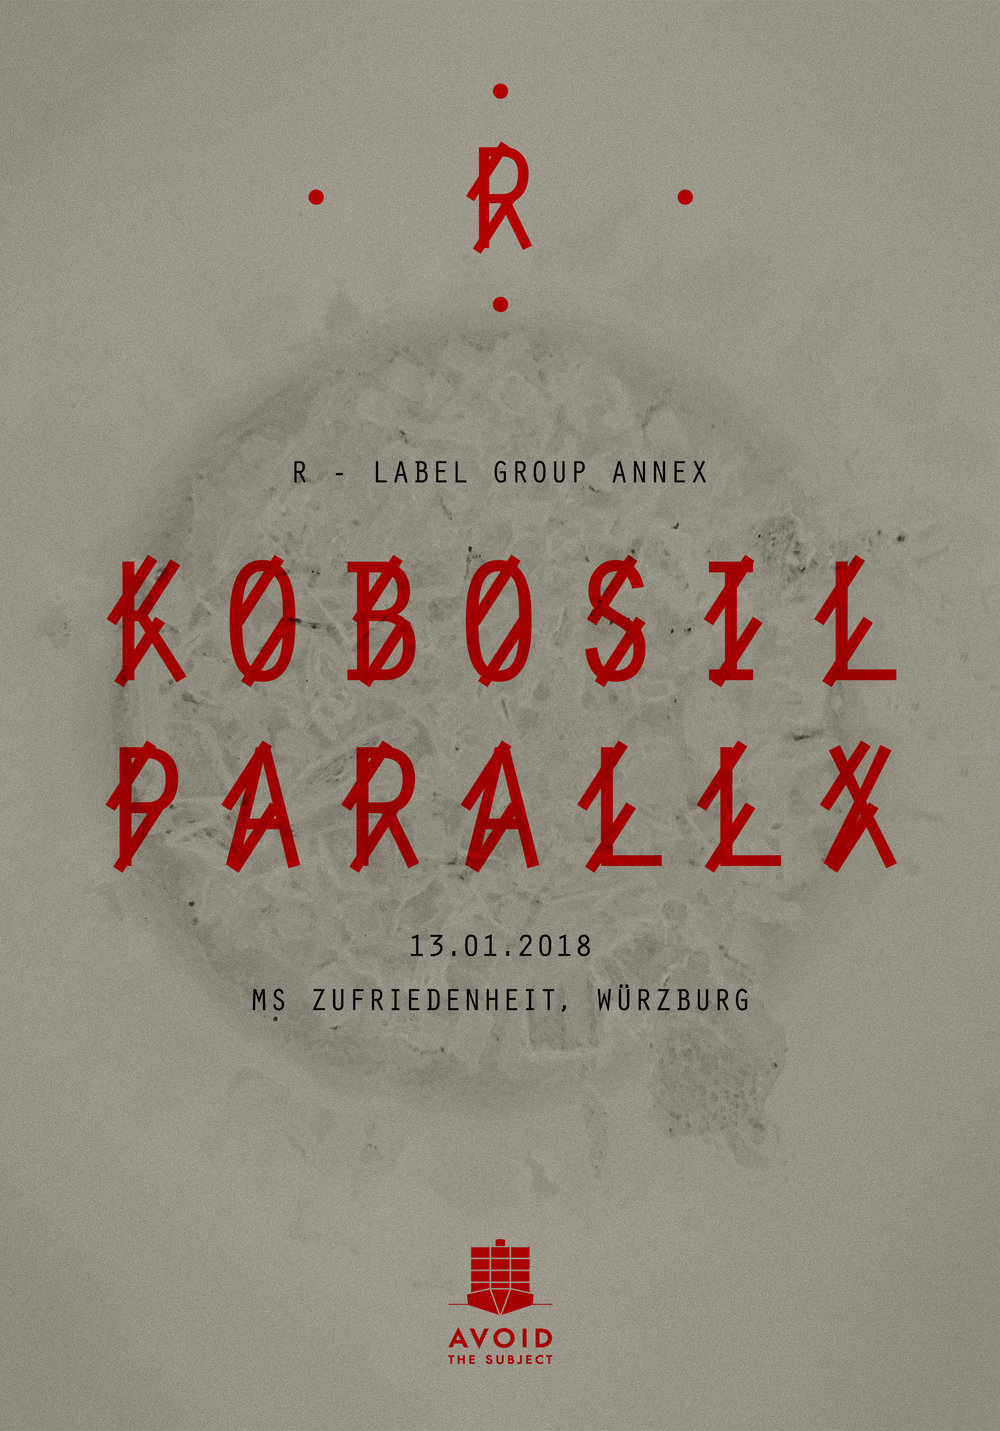 R_MSZ_A2_digital_poster.jpg